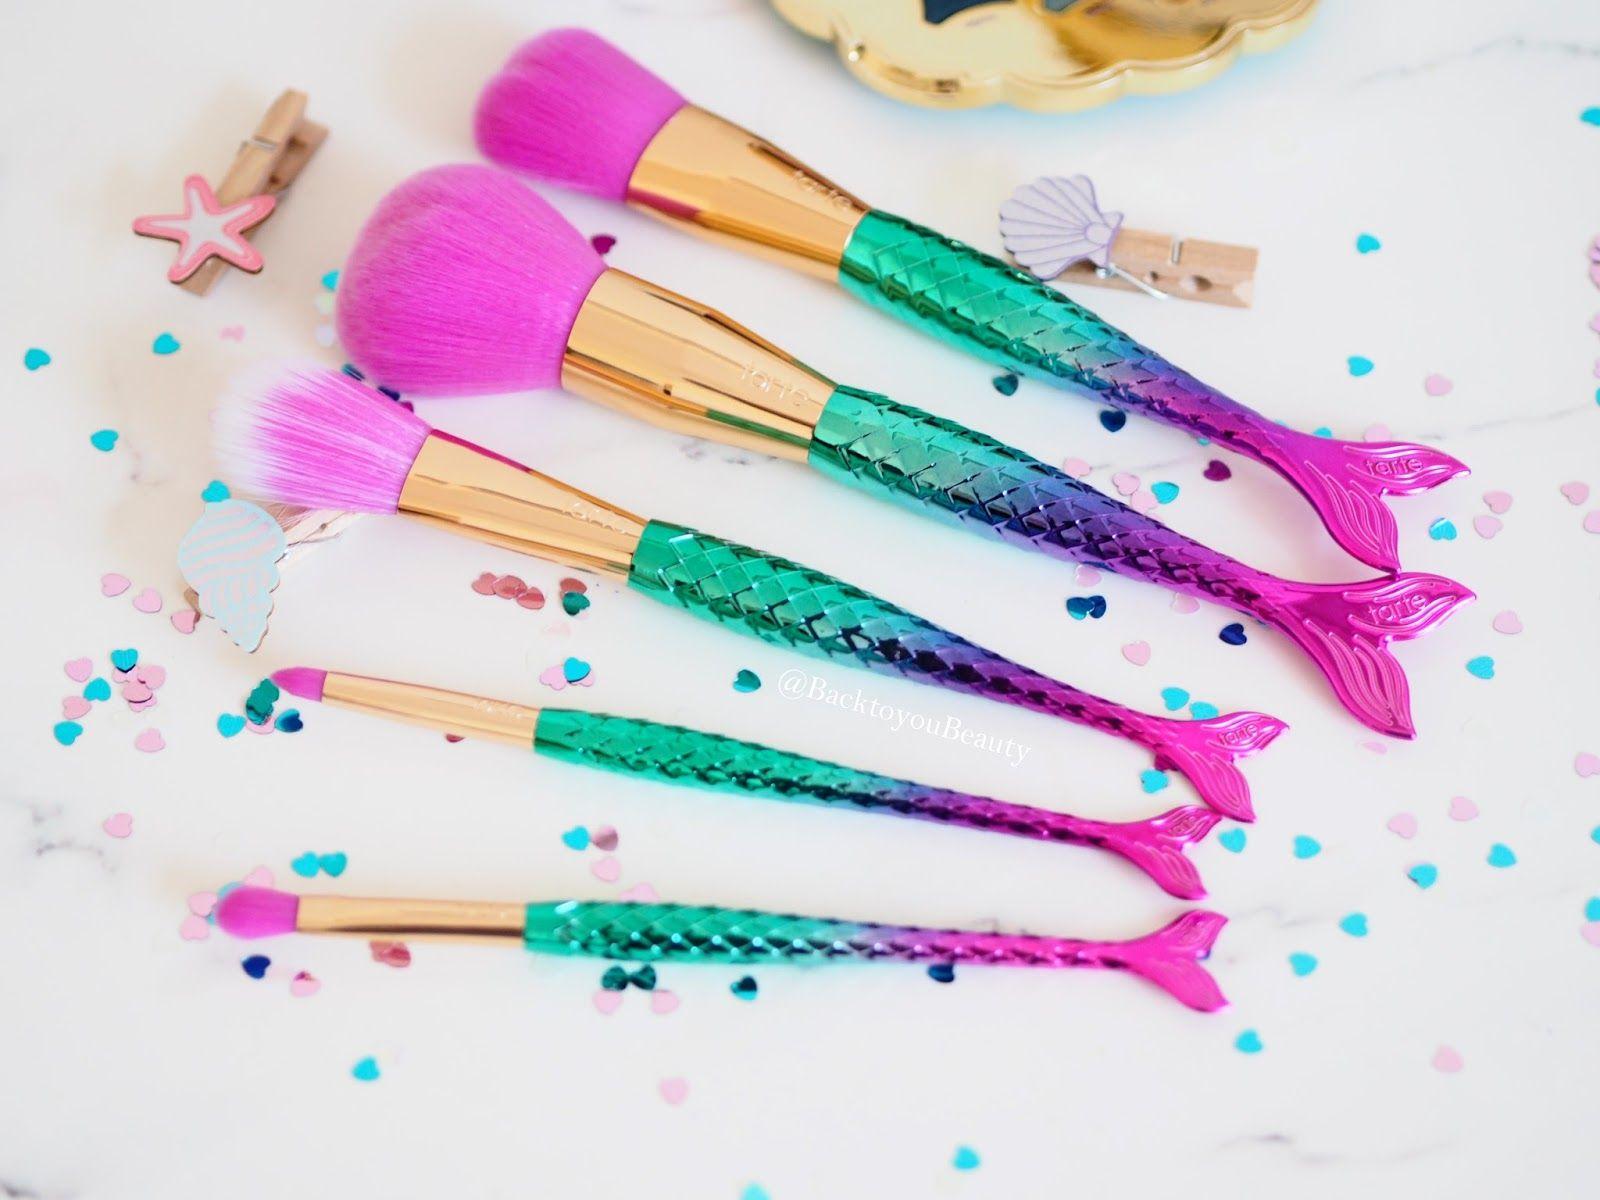 Tarte 5 minutes to mermaid brushes Mermaid makeup